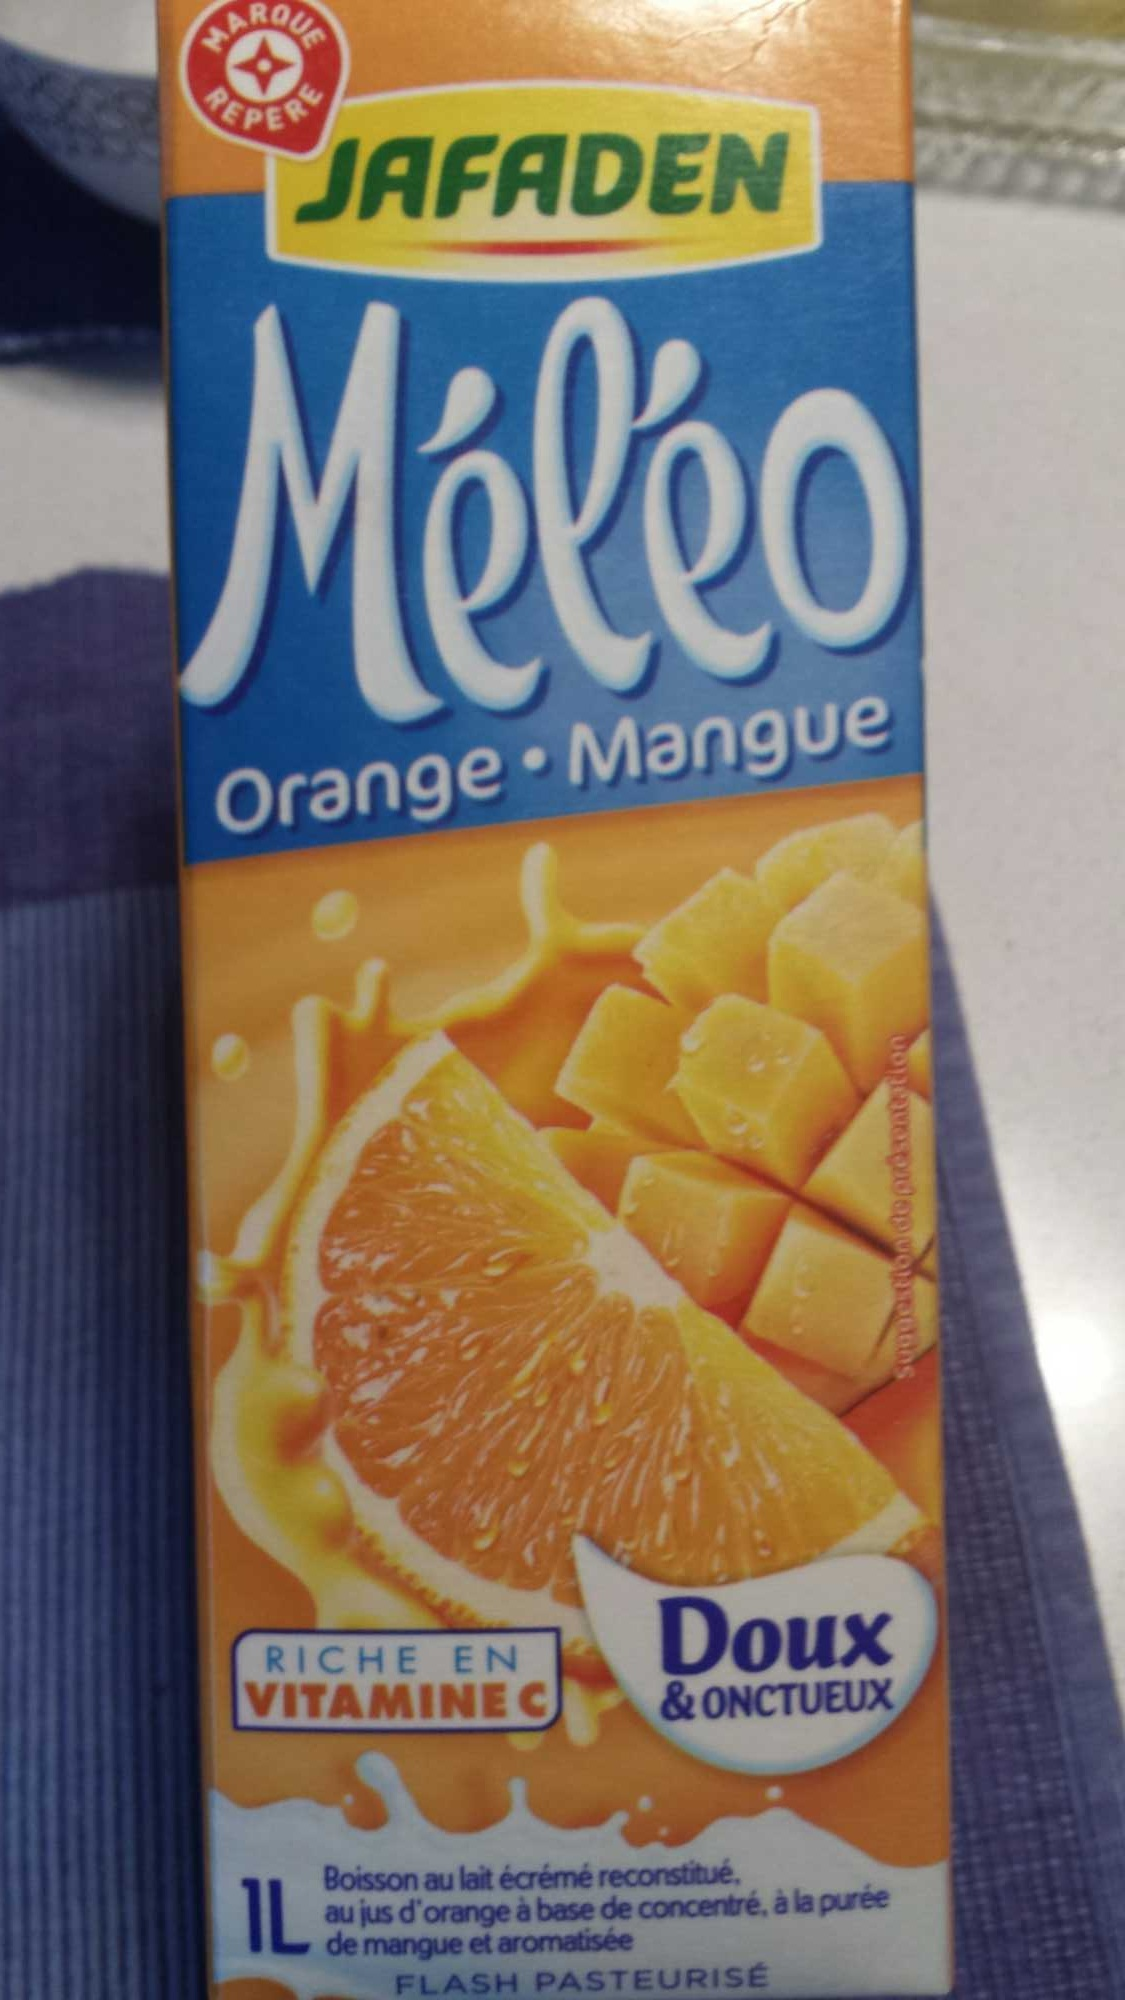 Méléo orange-mangue - Produit